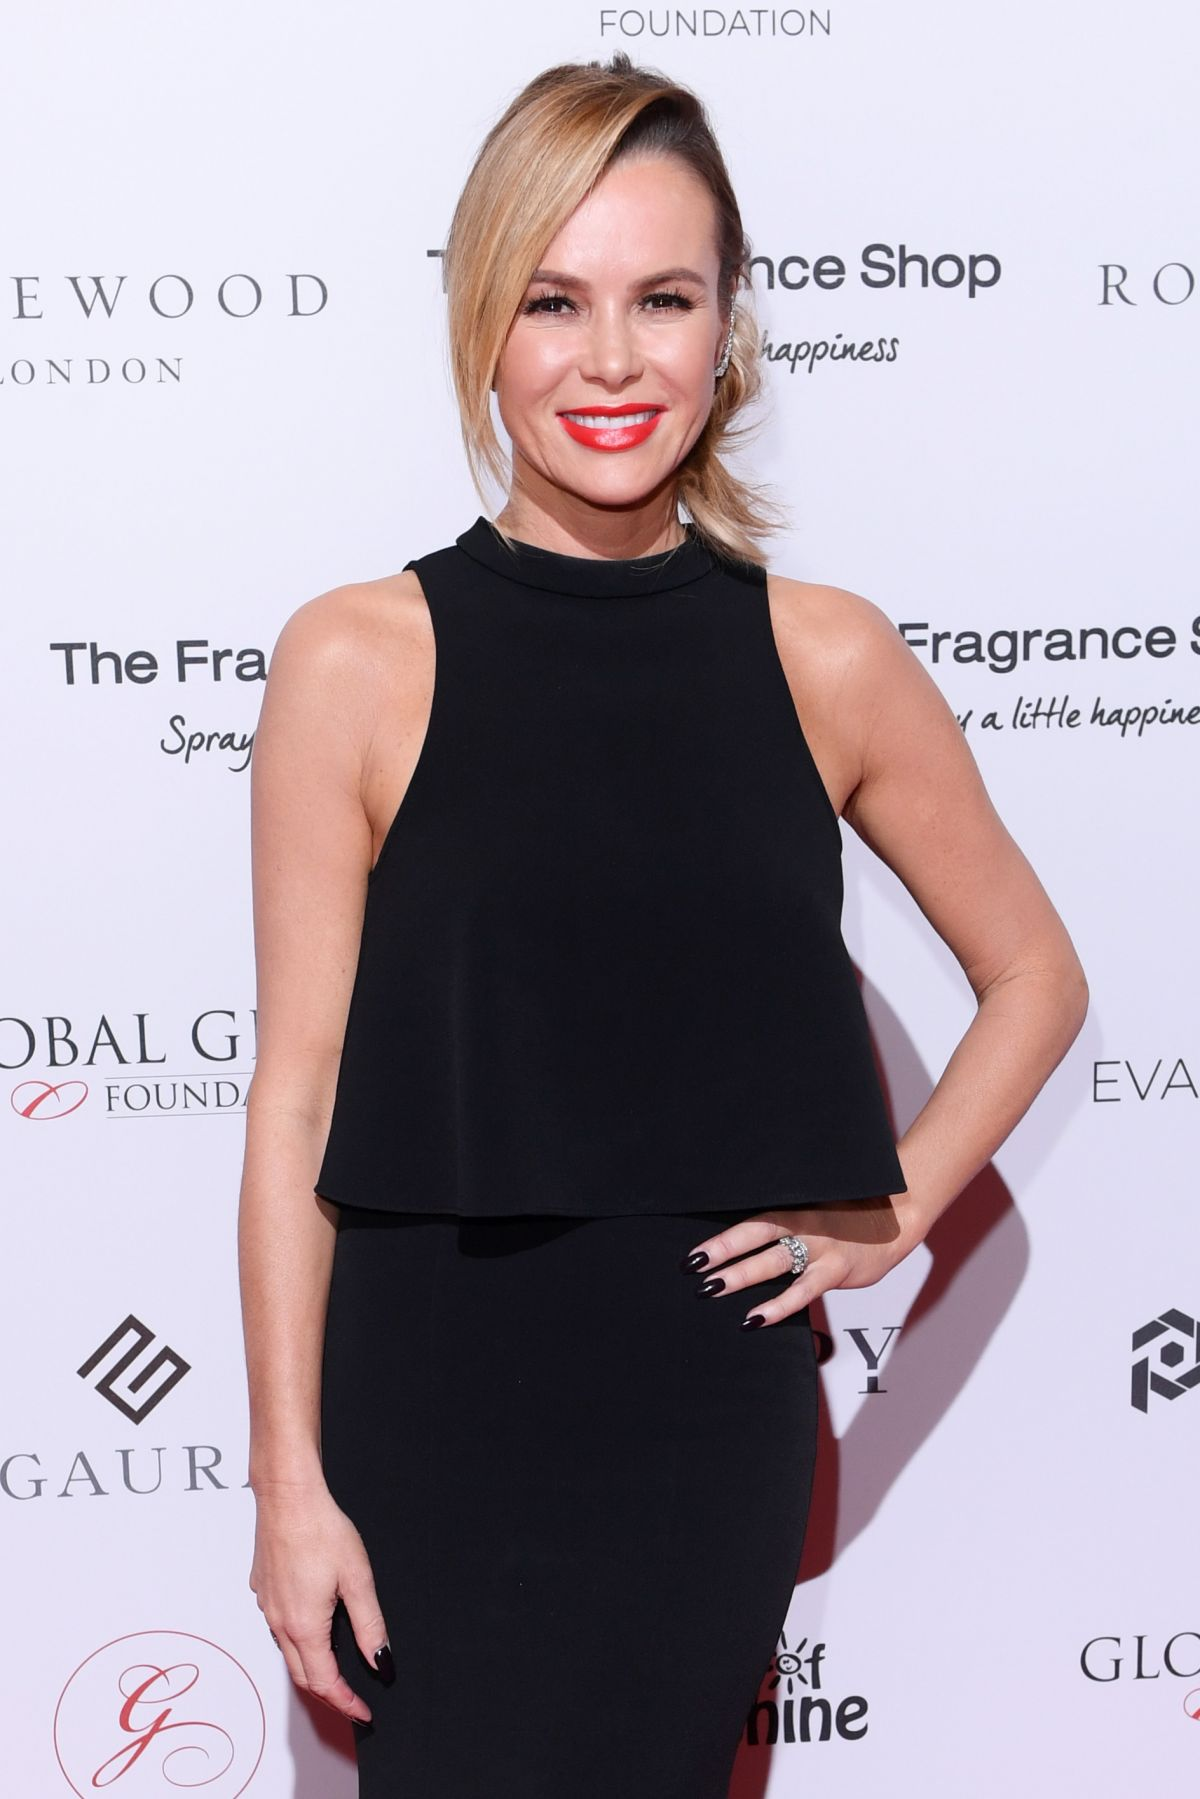 ae455060008 AMANDA HOLDEN at Global Gift Gala in London 11 02 2018 - HawtCelebs